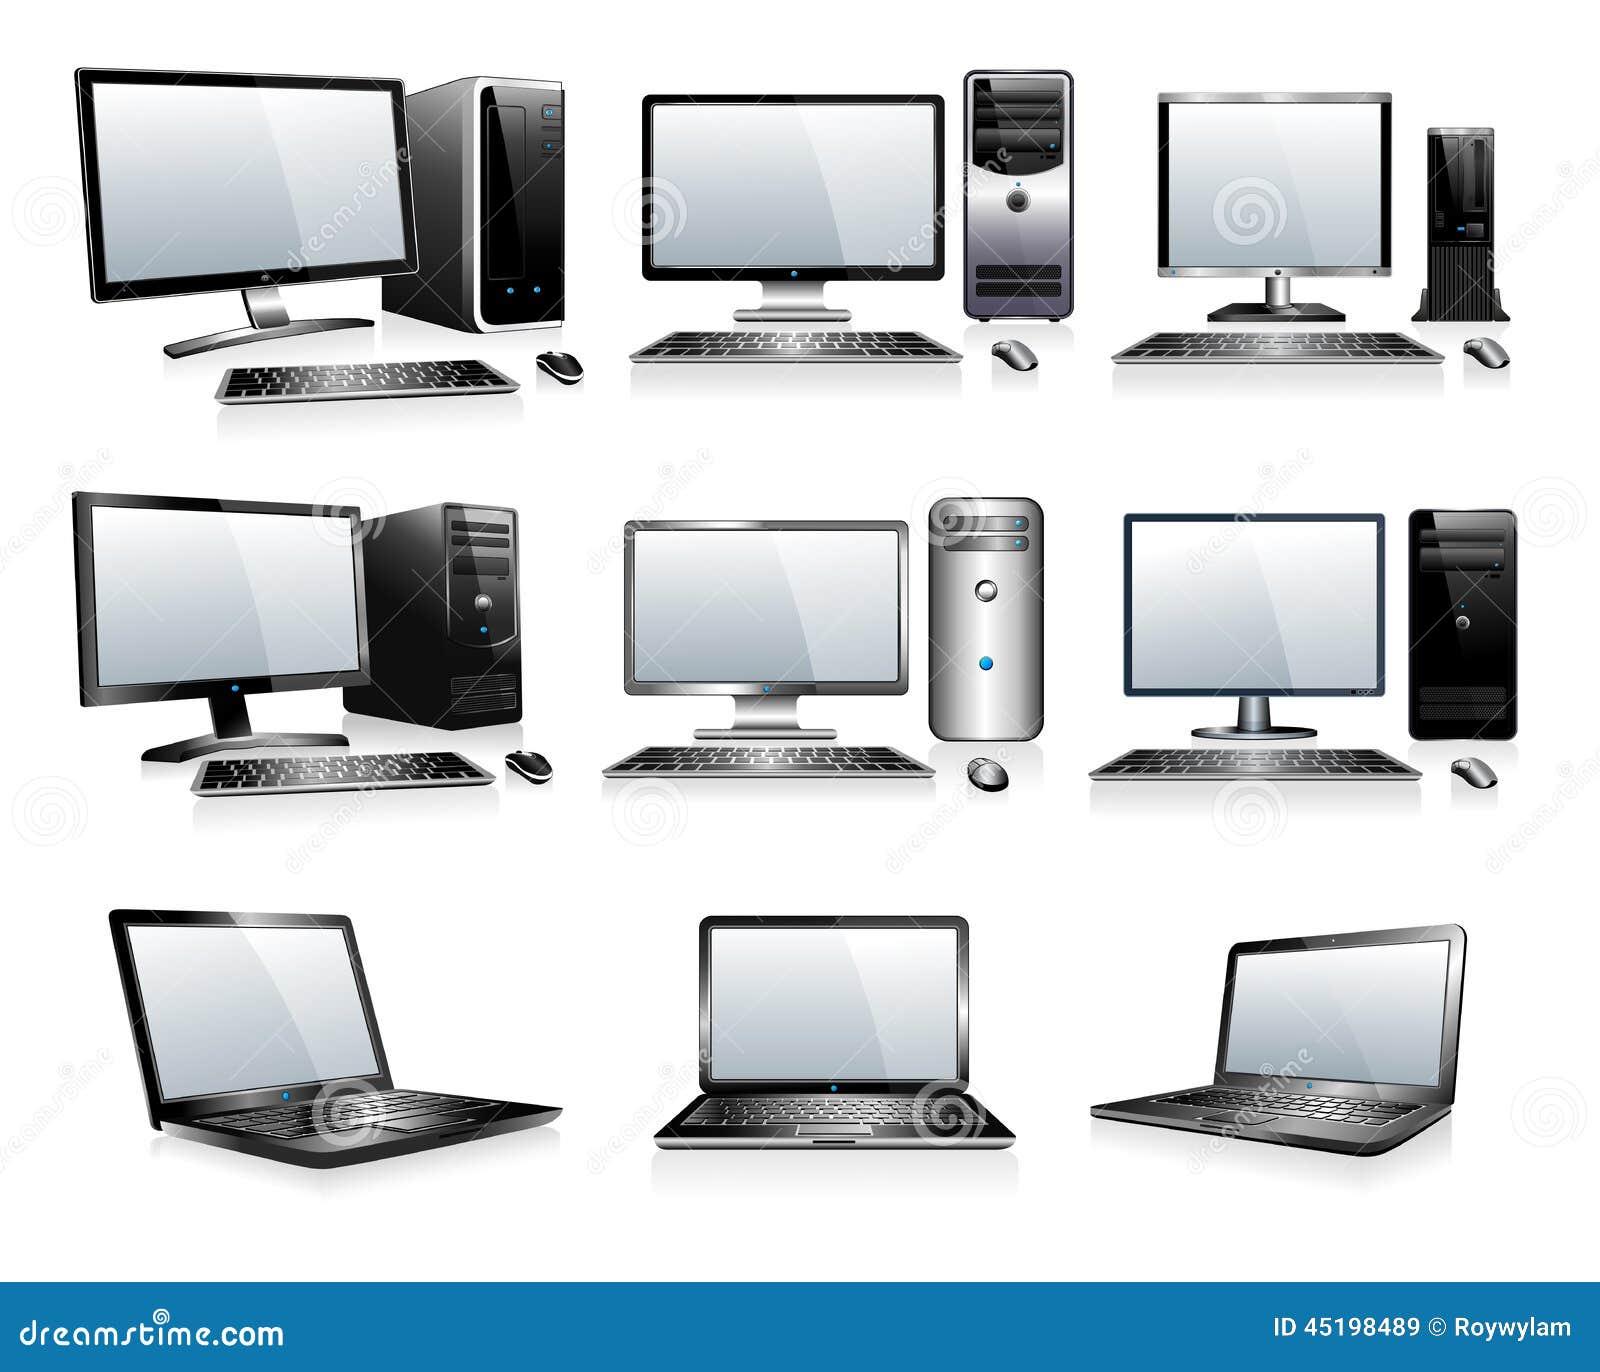 Computers Technology: Computer Technology Electronics